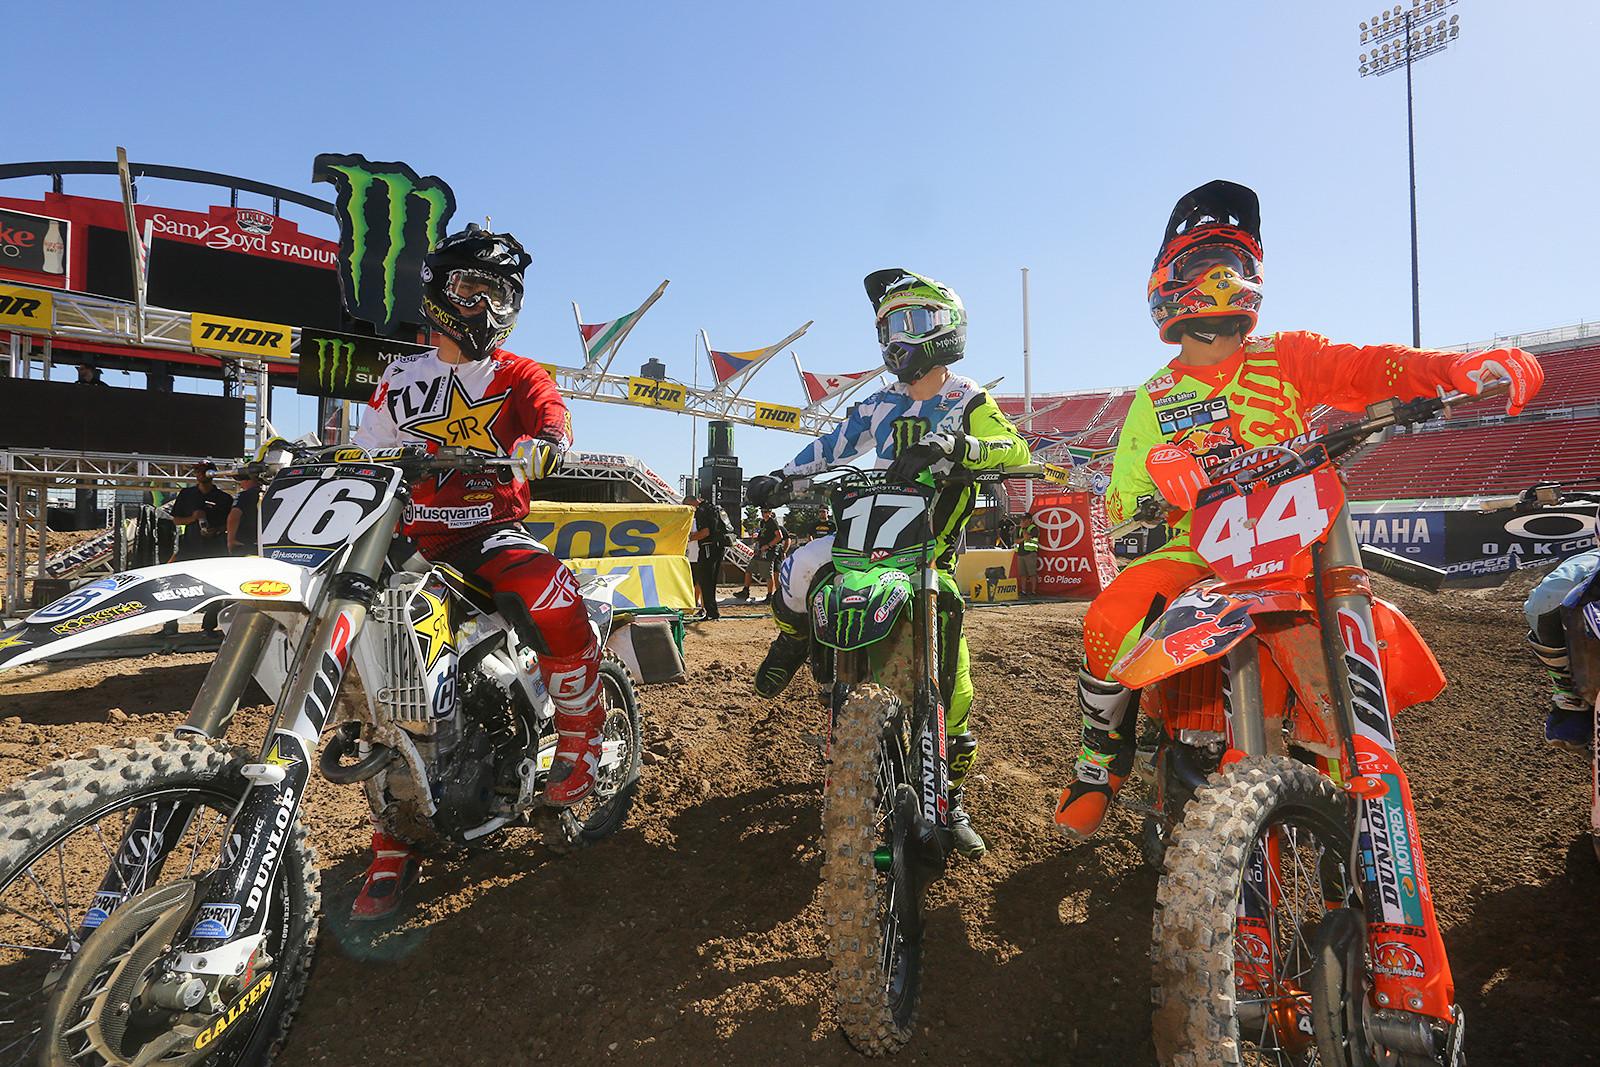 Zach Osborne, Joey Savatgy, and Jordon Smith - Vital MX Pit Bits: Las Vegas - Motocross Pictures - Vital MX